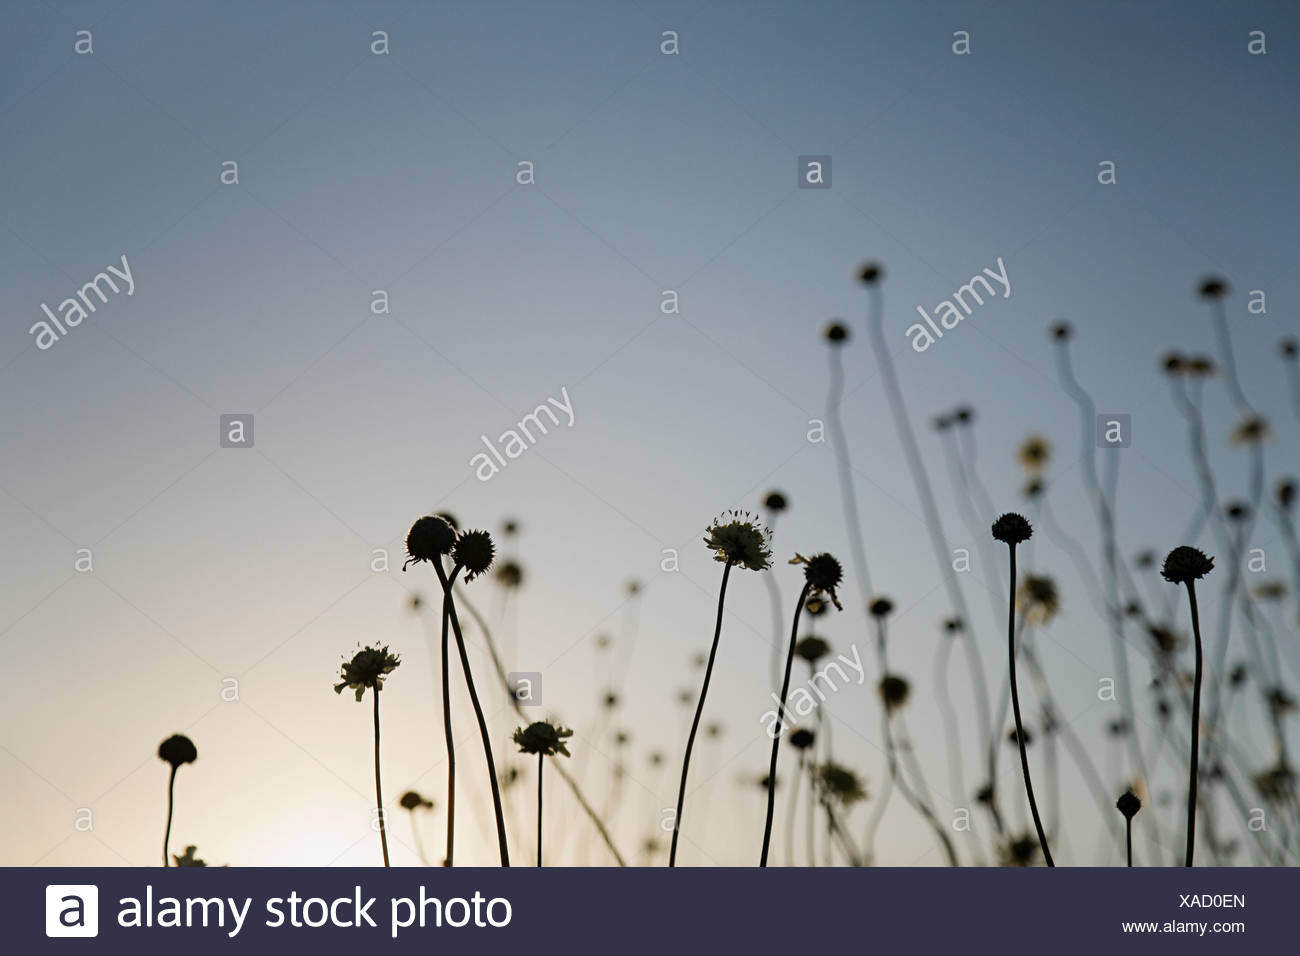 Silhouette Pflanzen bei Sonnenuntergang Stockbild